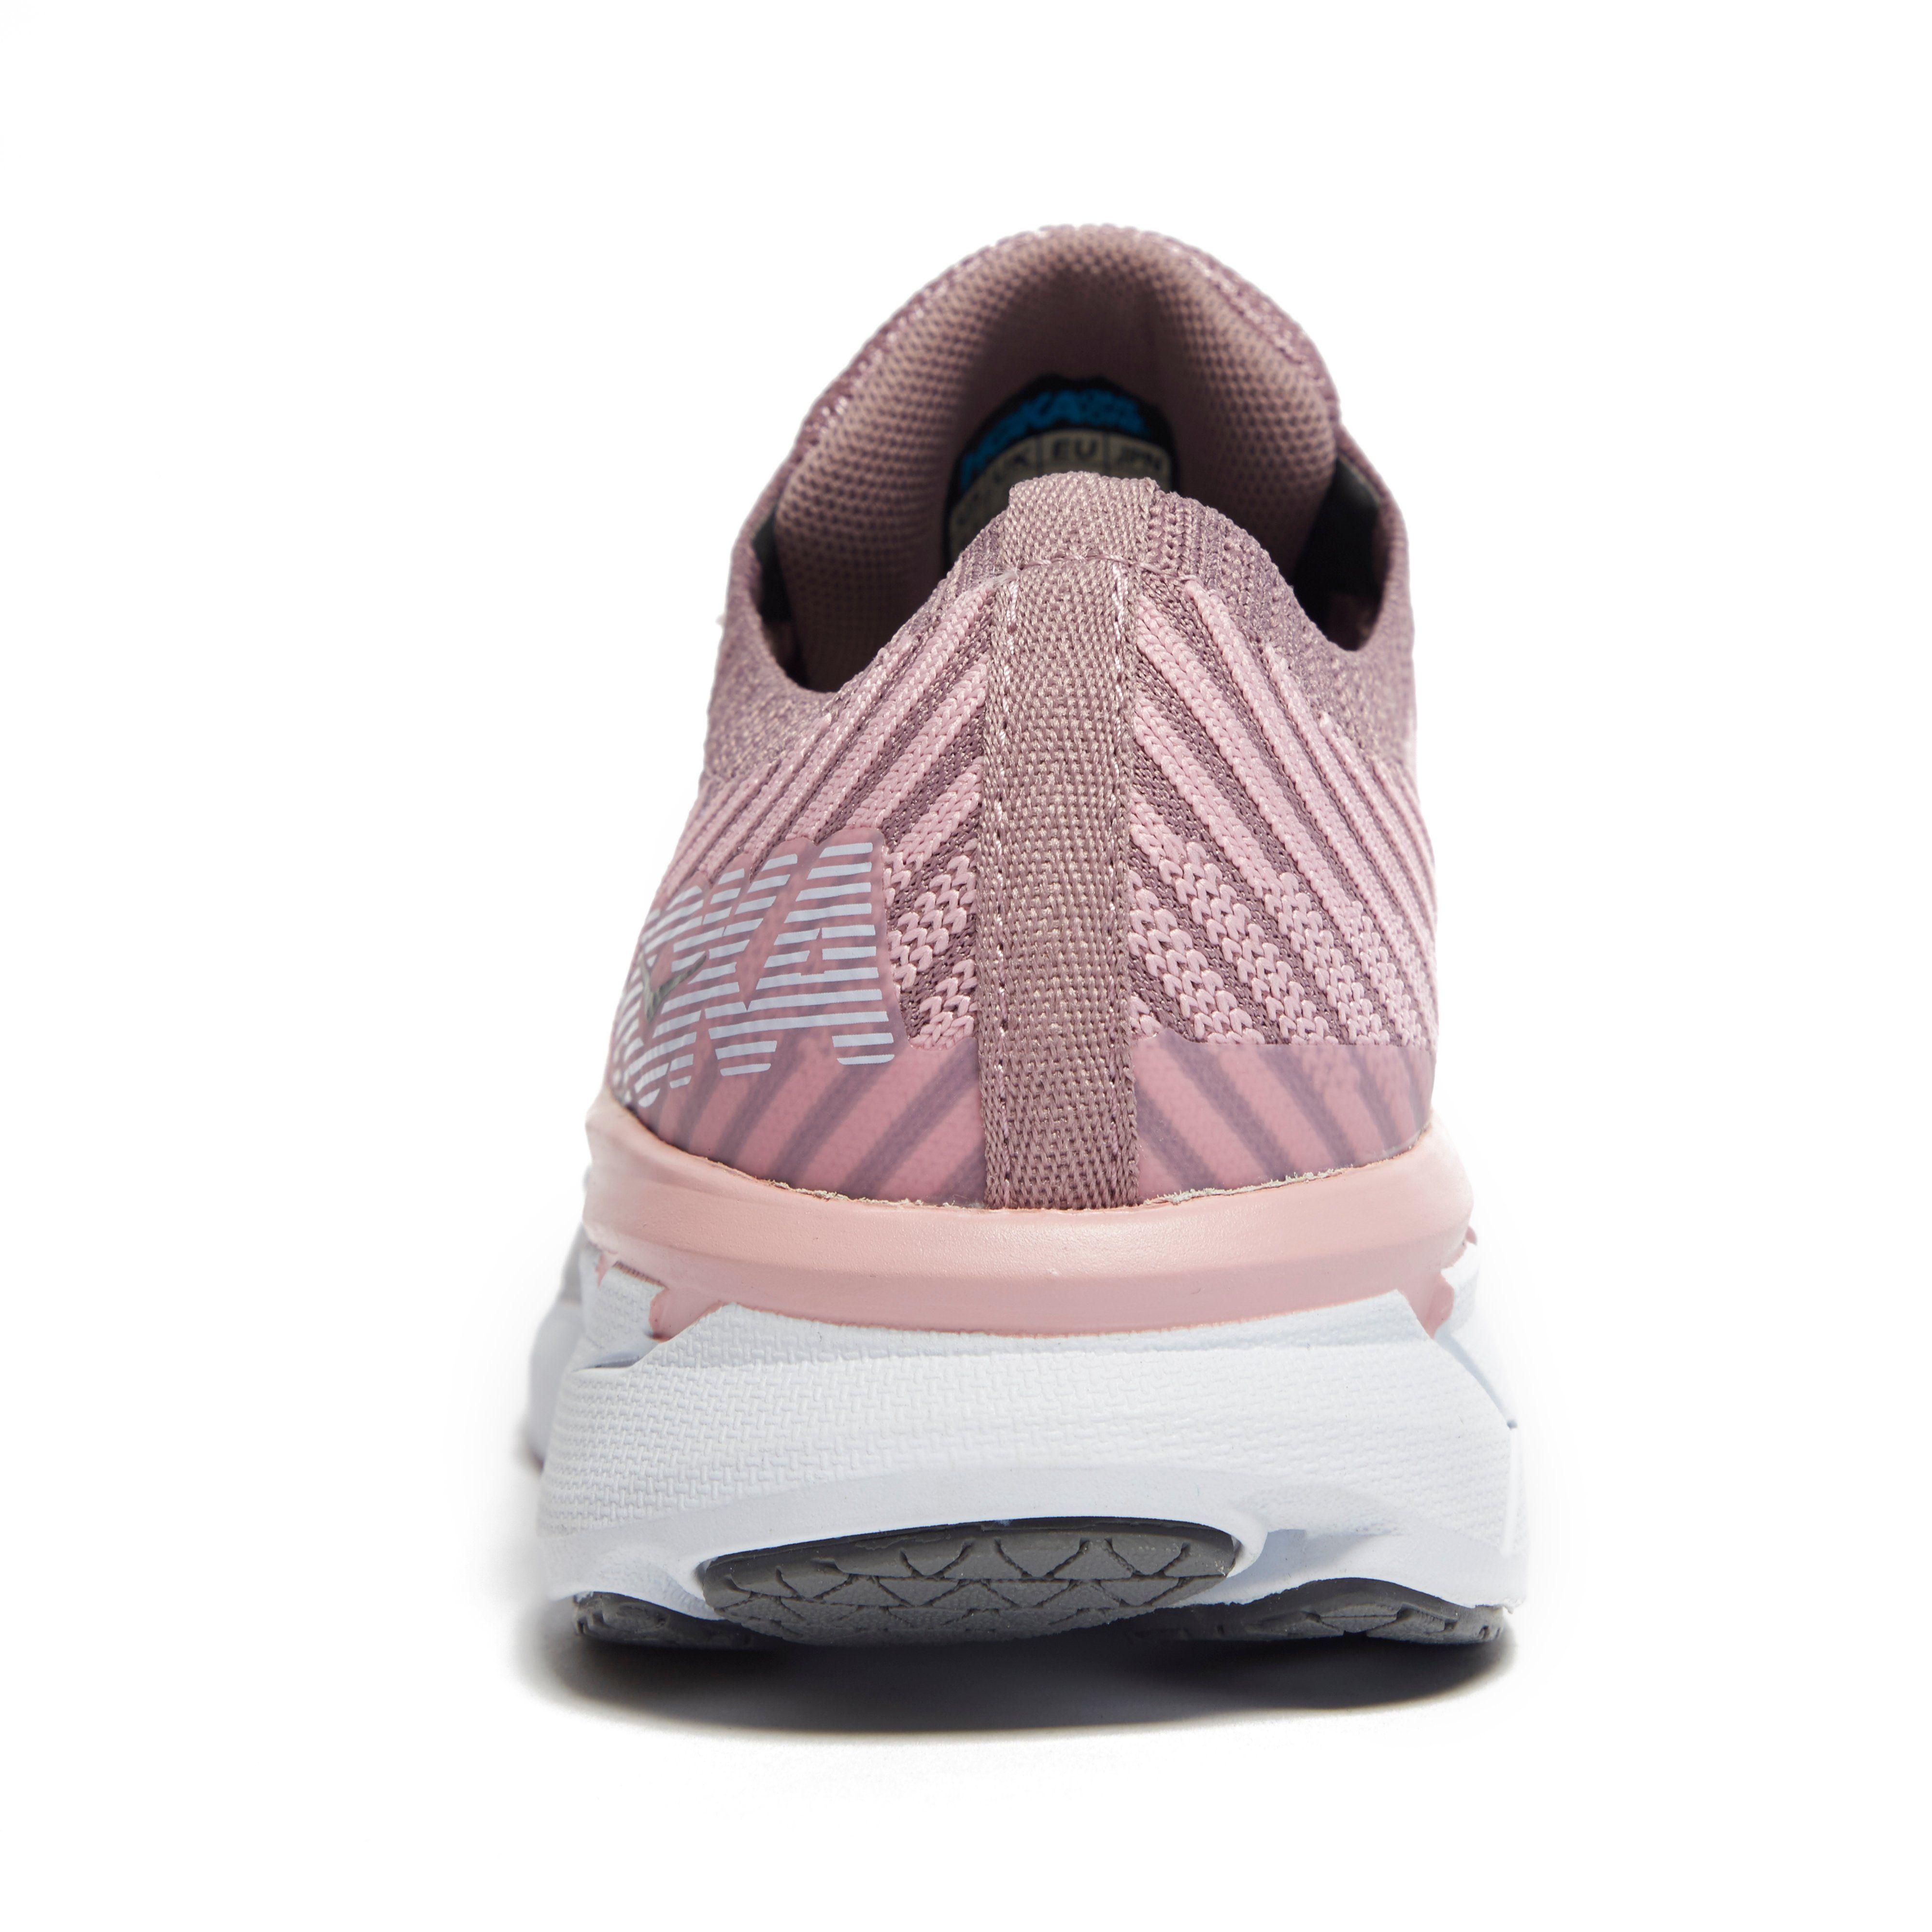 Hoka One One Clifton 5 Knit Women's Running Shoes